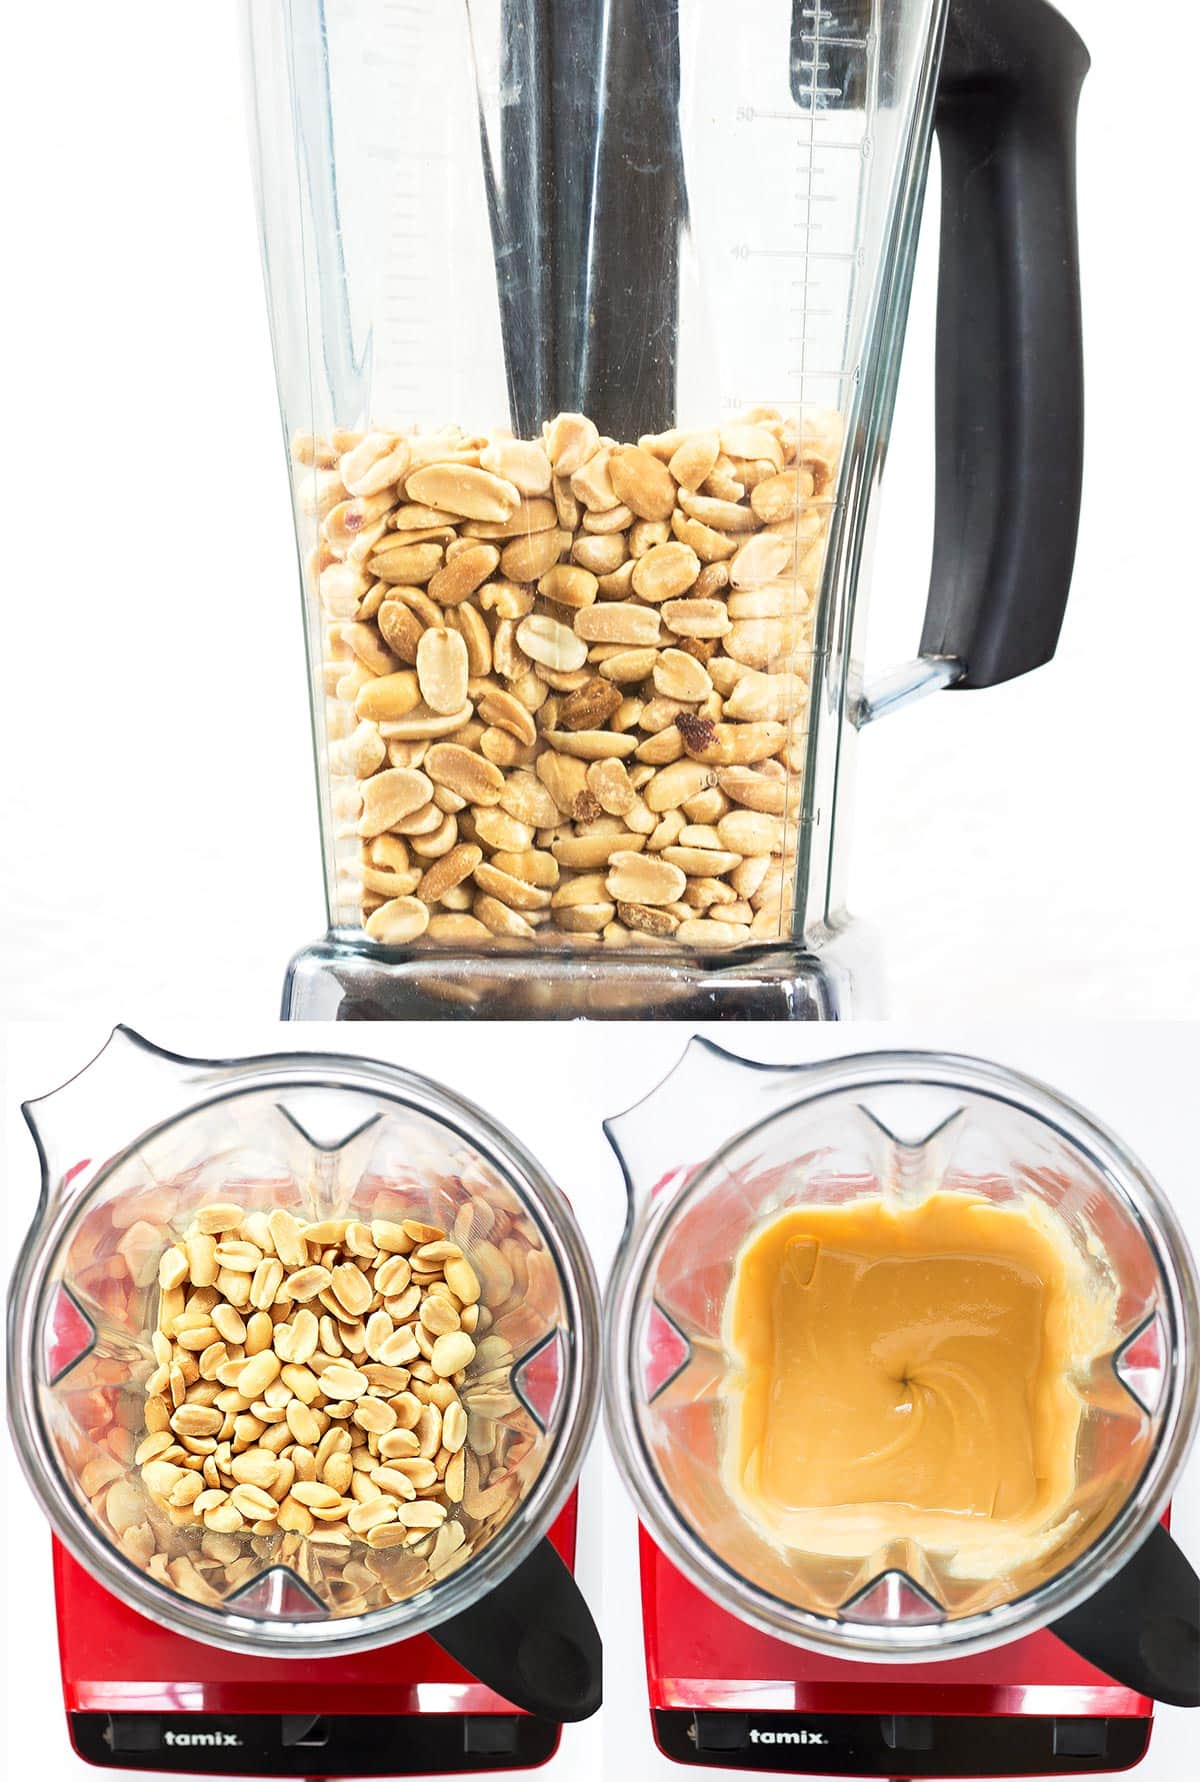 Making Peanut Butter in a Vitamix Blender